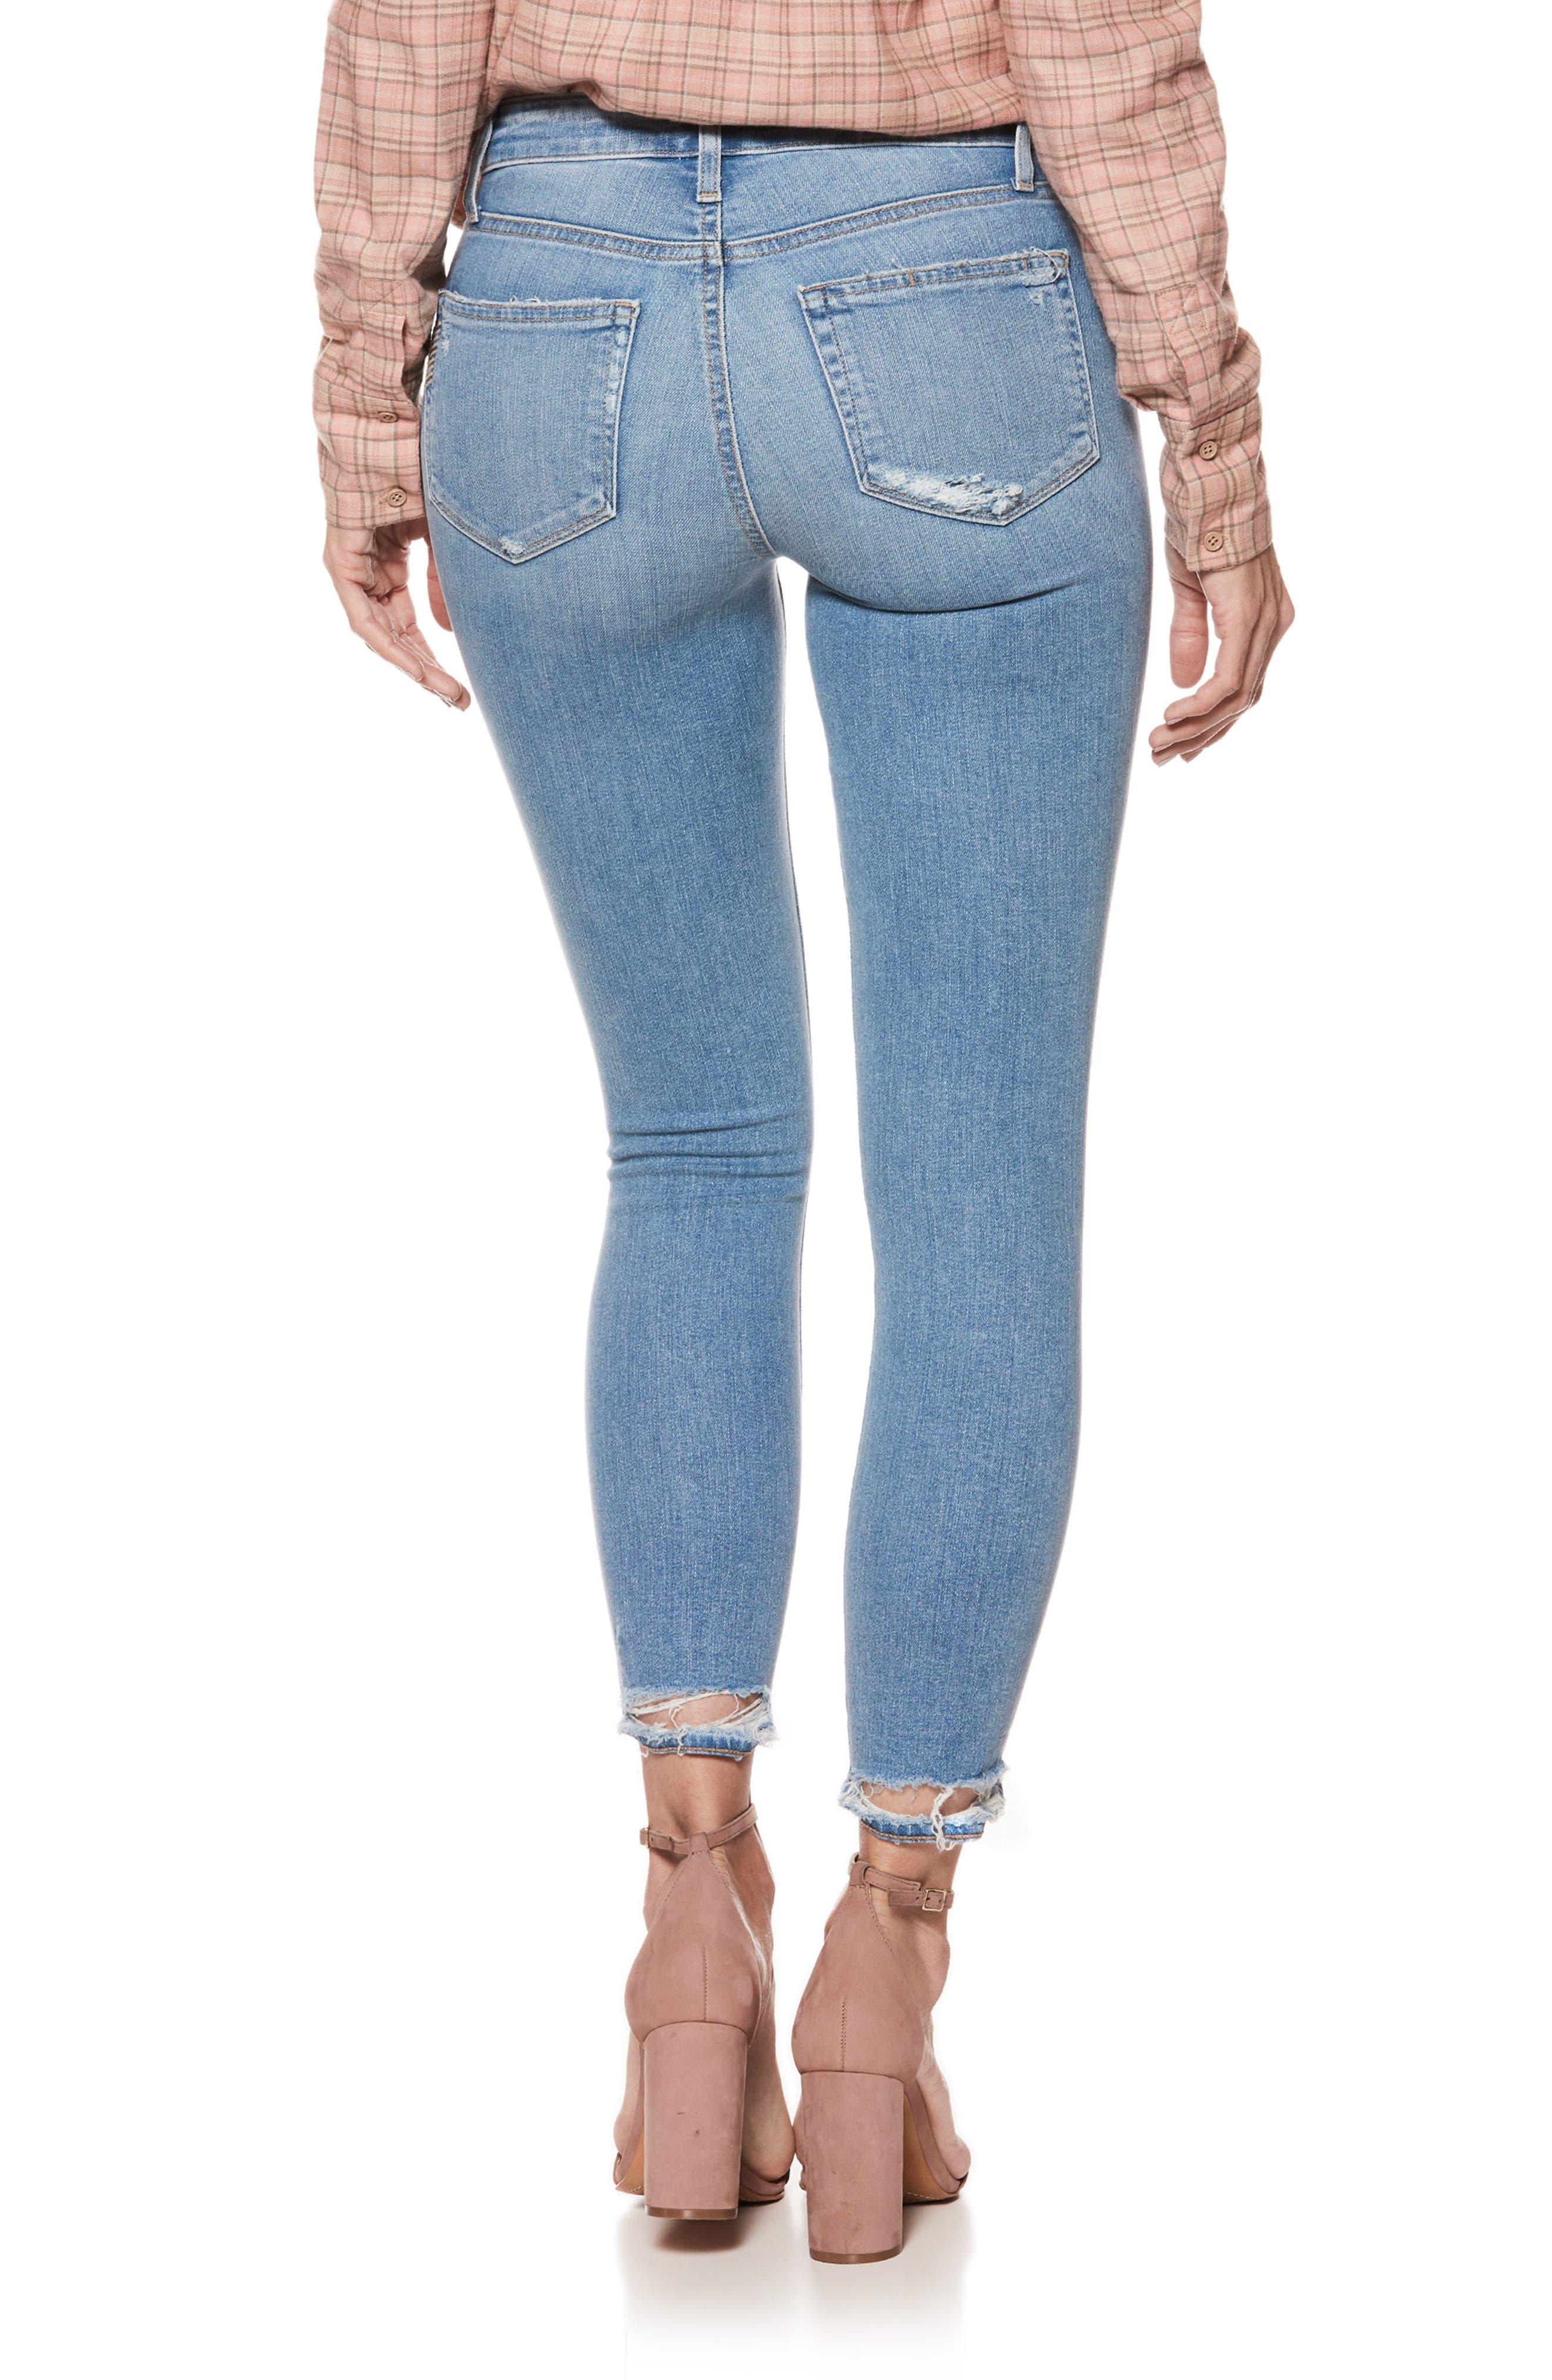 Hoxton High Waist Crop Skinny Jeans,                             Alternate thumbnail 3, color,                             Atterbury W/ Torn Back Hem